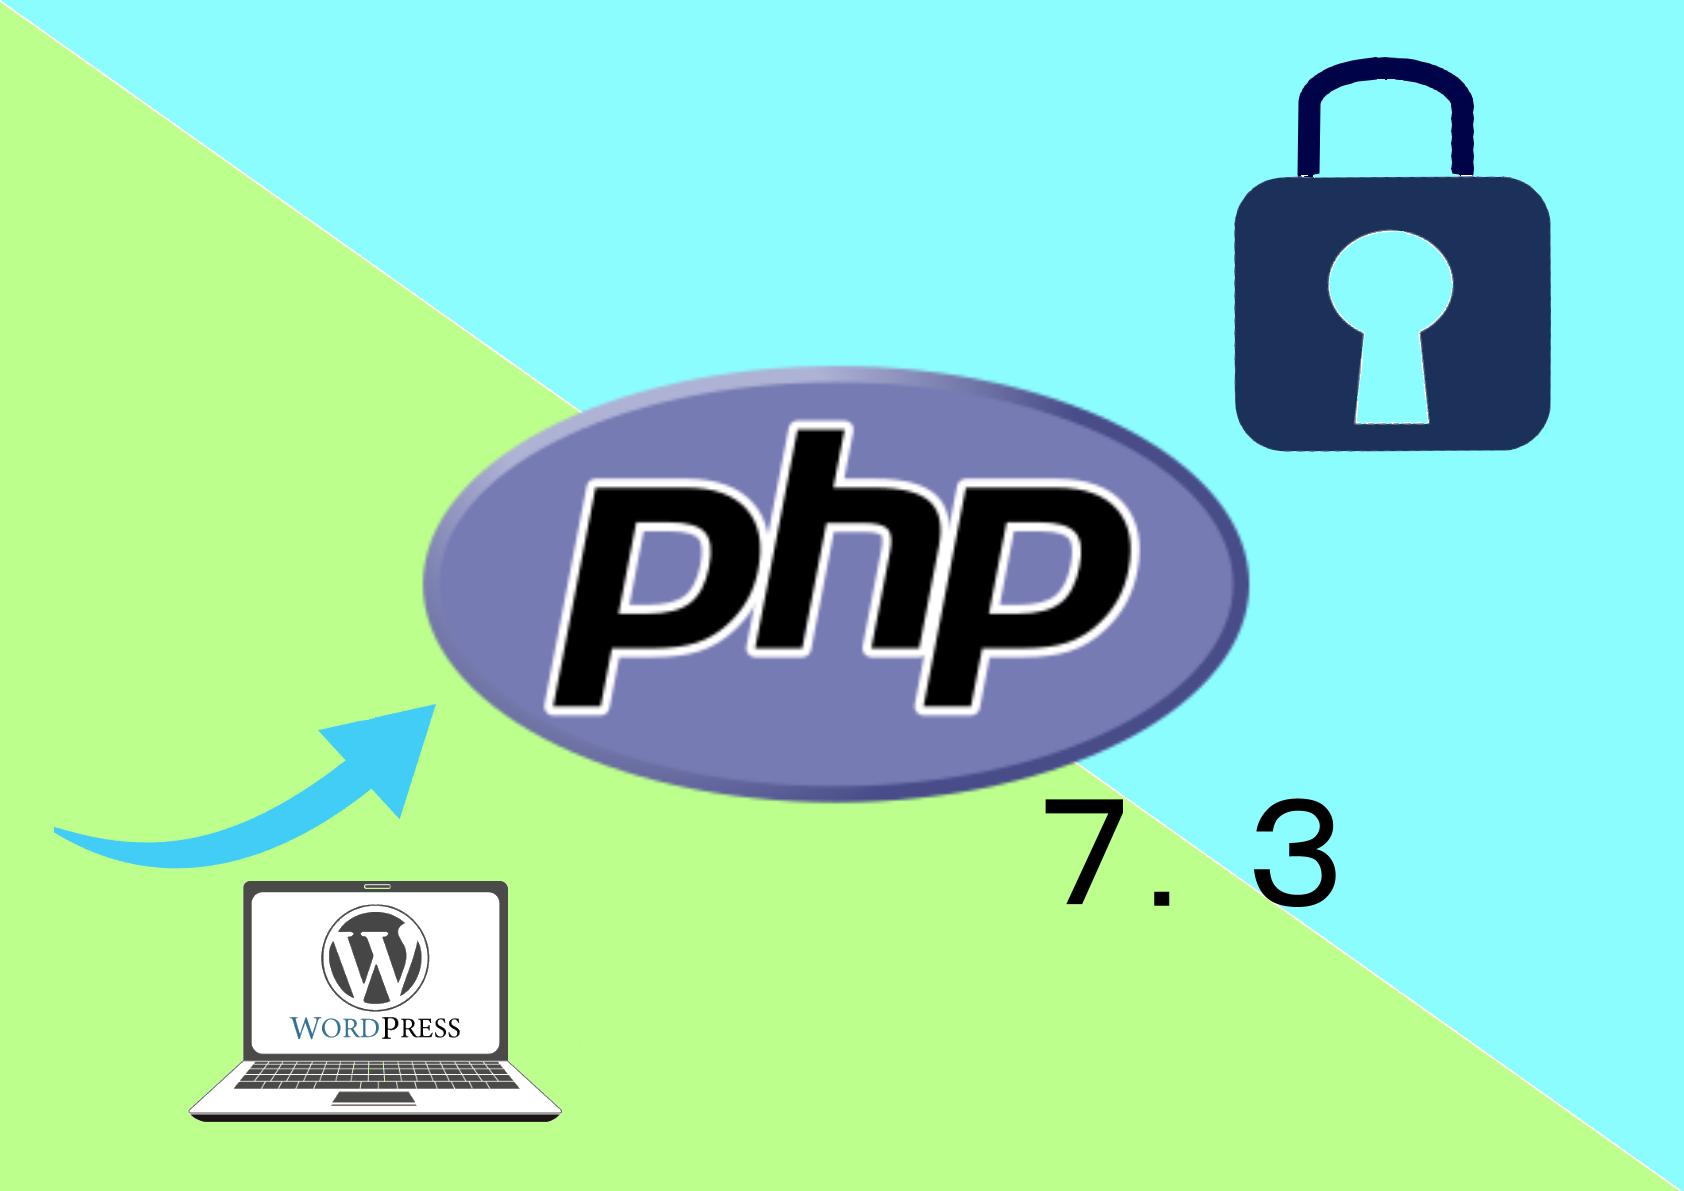 WordPressのPHPのバージョンは7.3